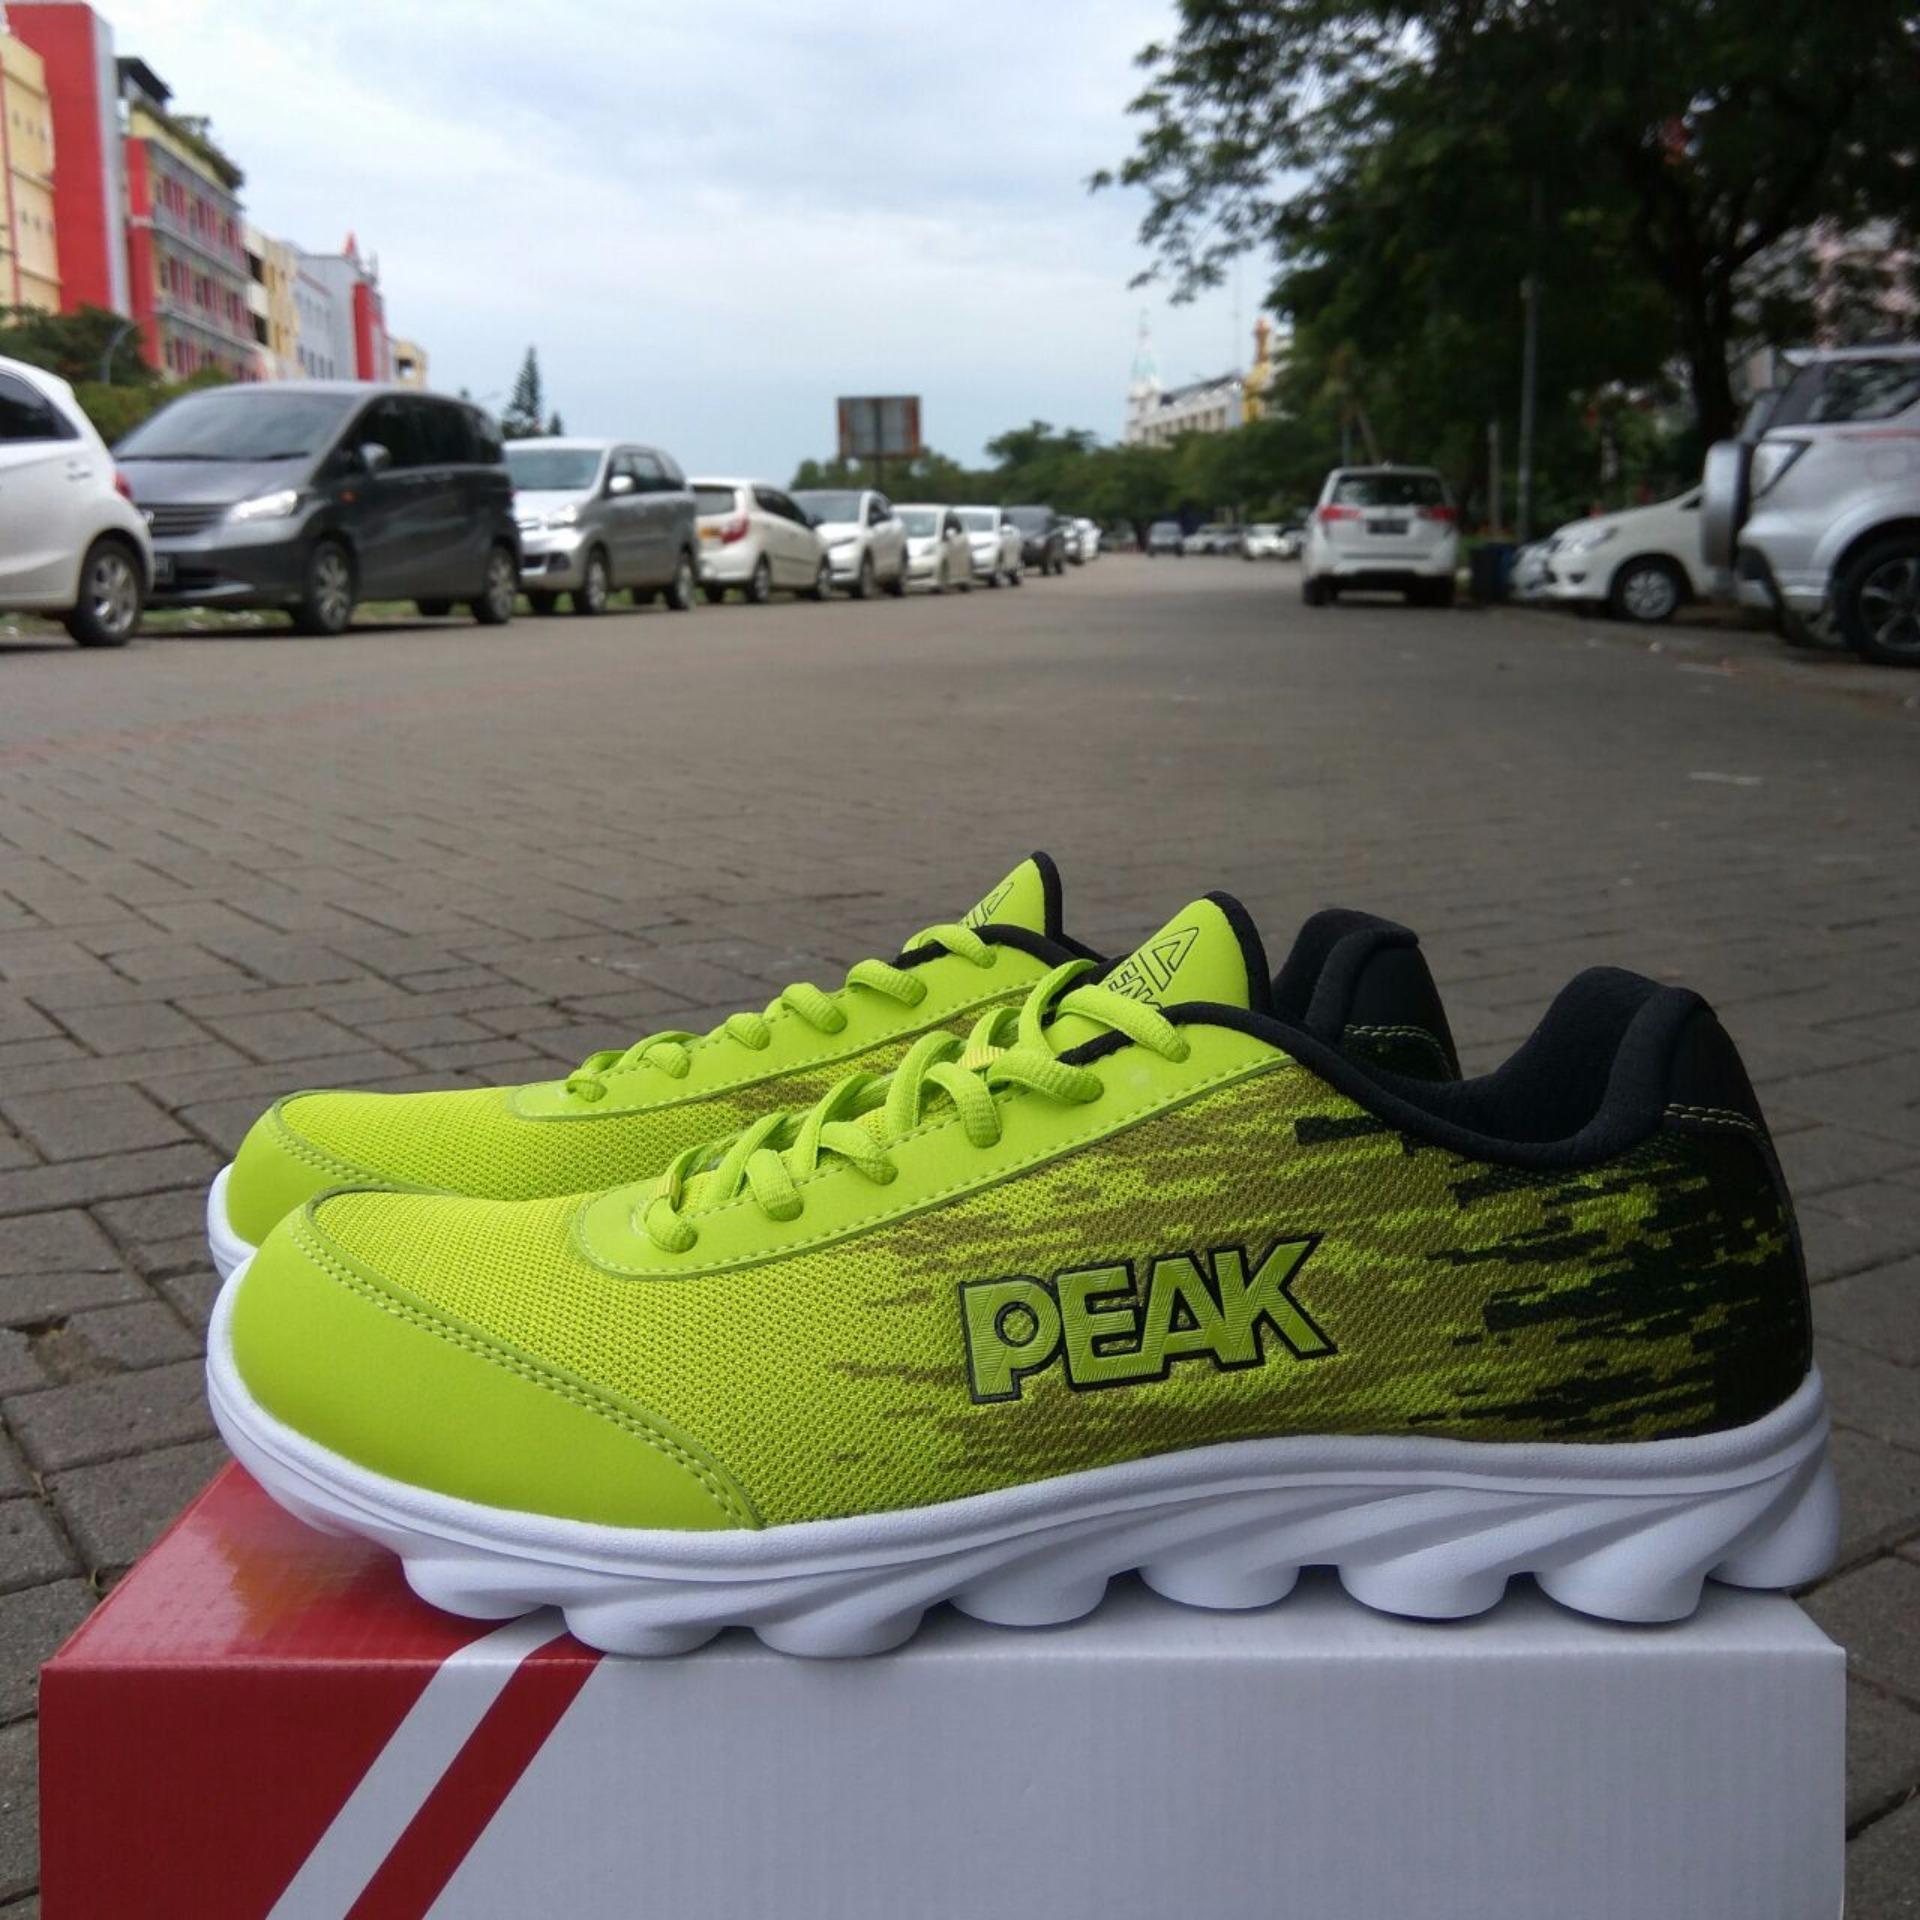 Sepatu Basket Peak E33373a All Day Edition Hitam - Info Daftar Harga ... 028a9ba2c7